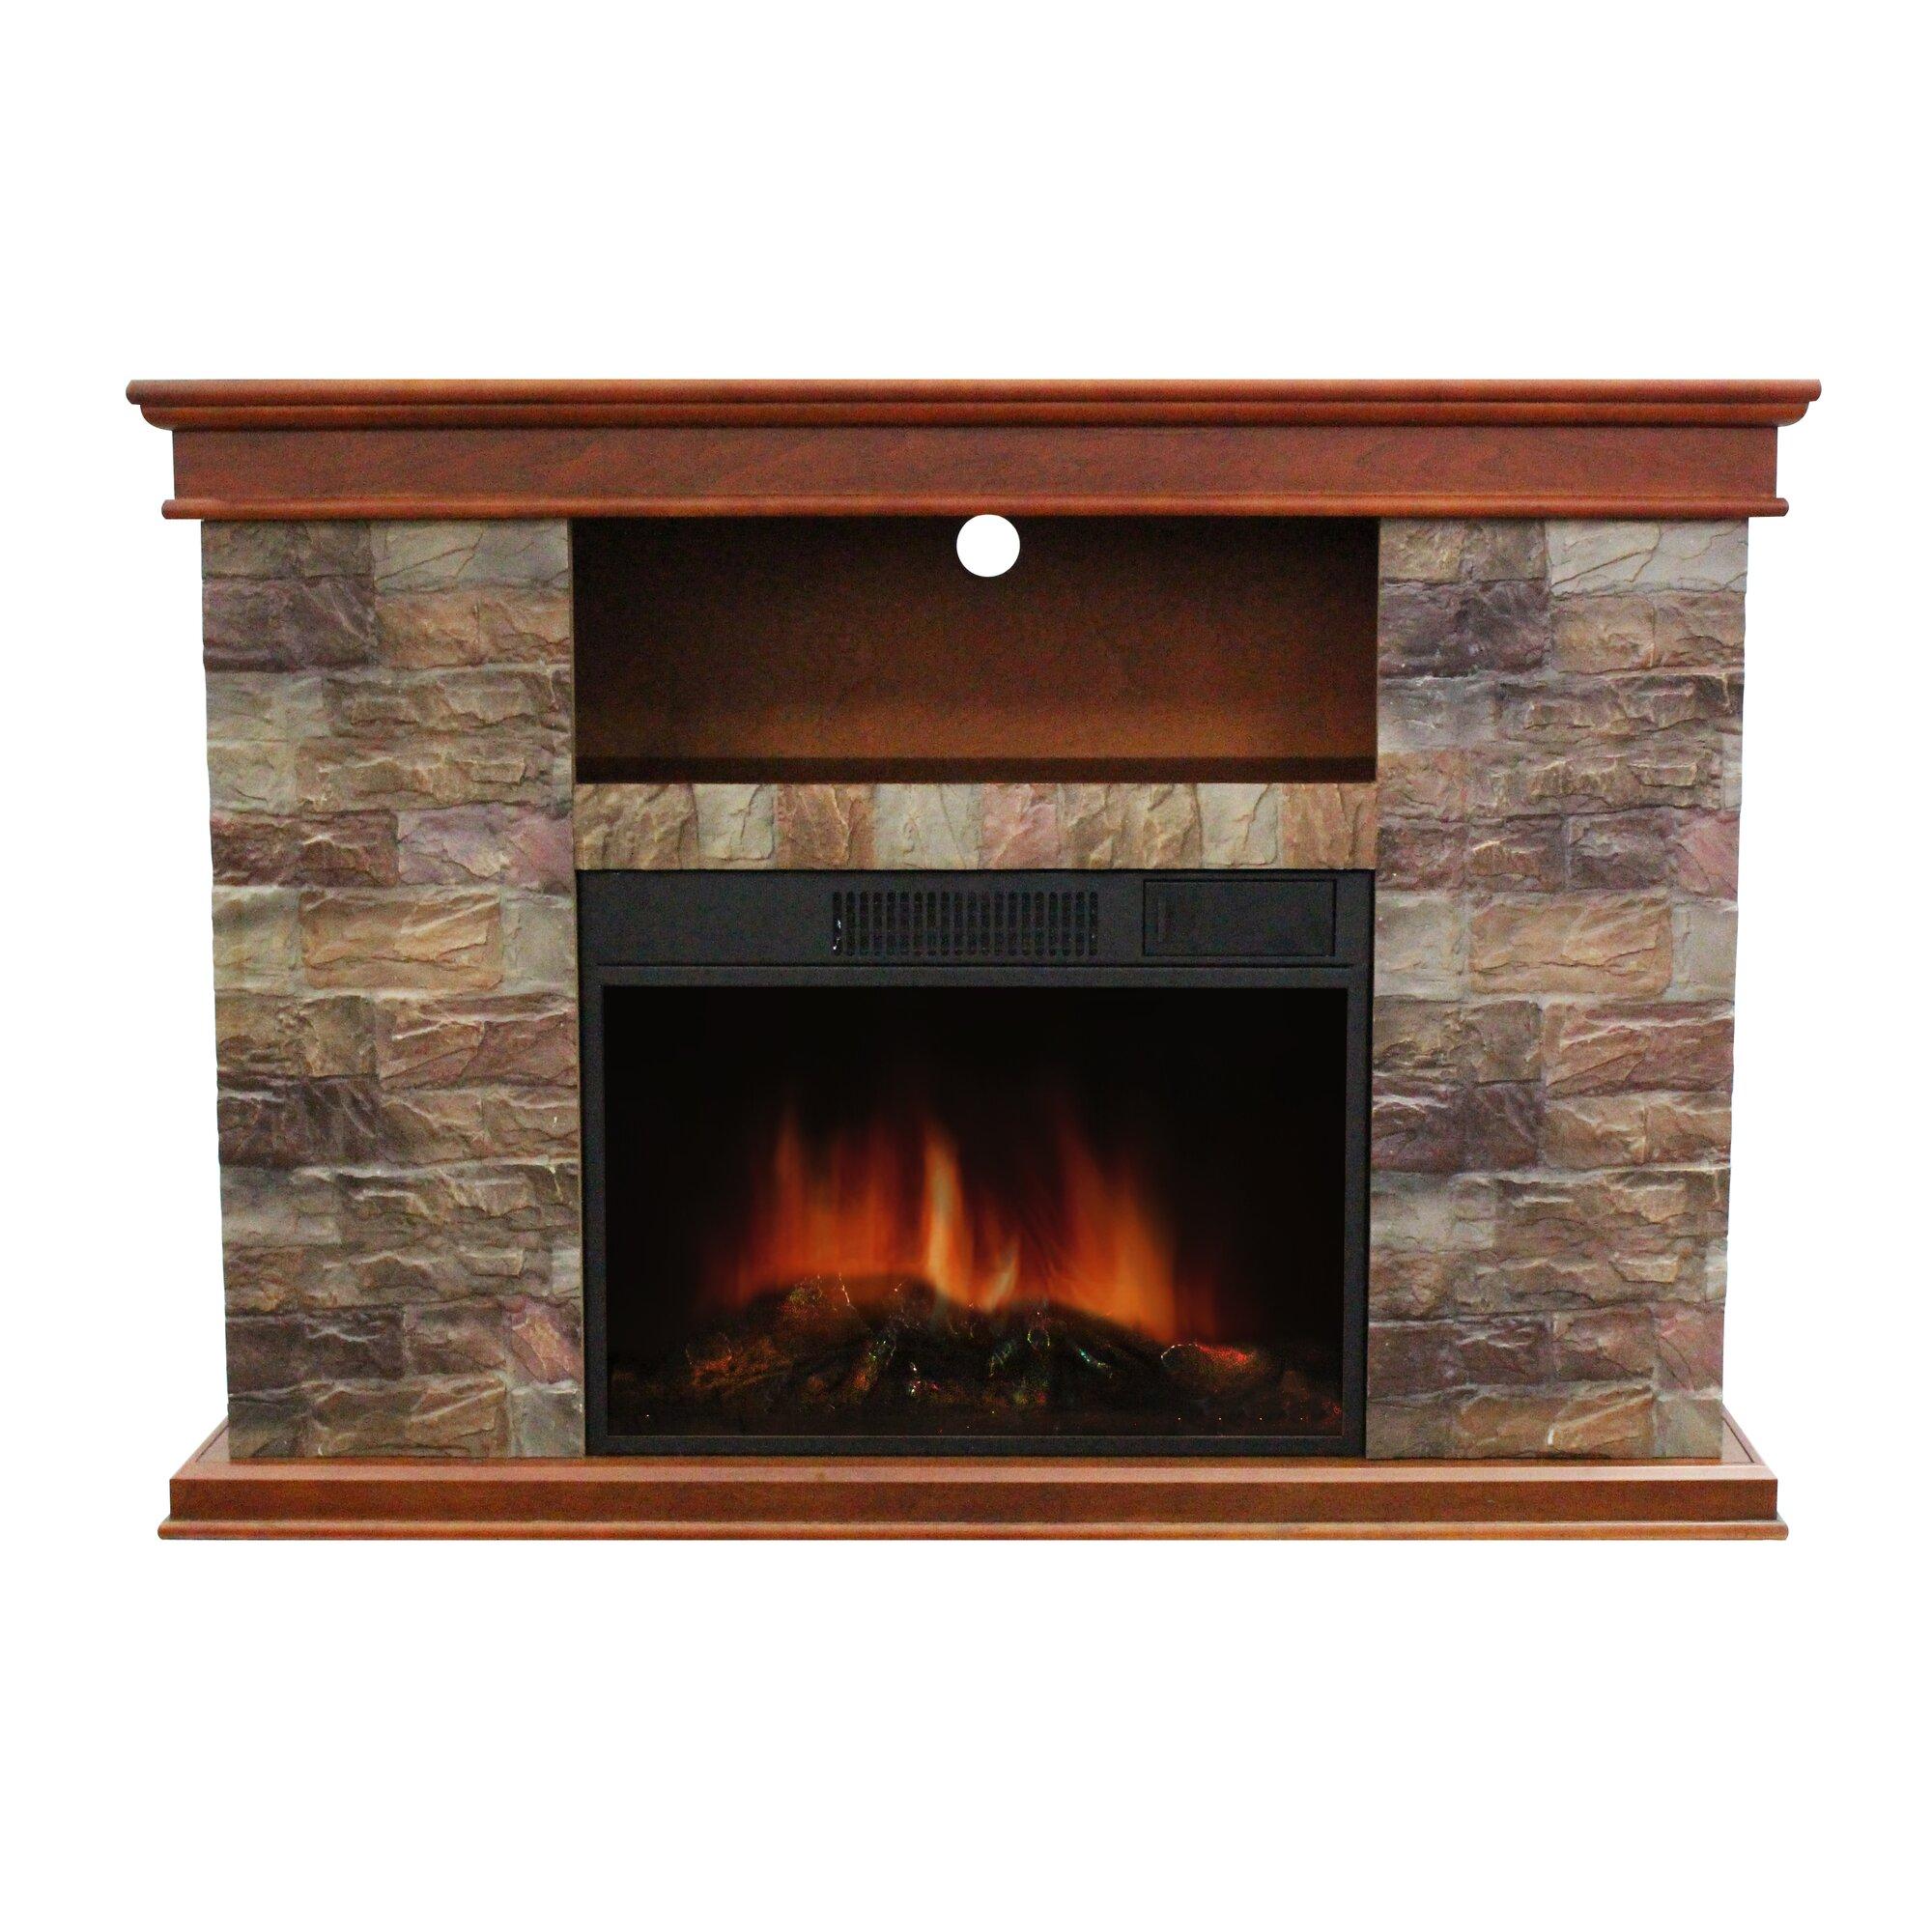 Bedroom electric fireplace - Bedroom Electric Fireplace Sanibel Electric Fireplace